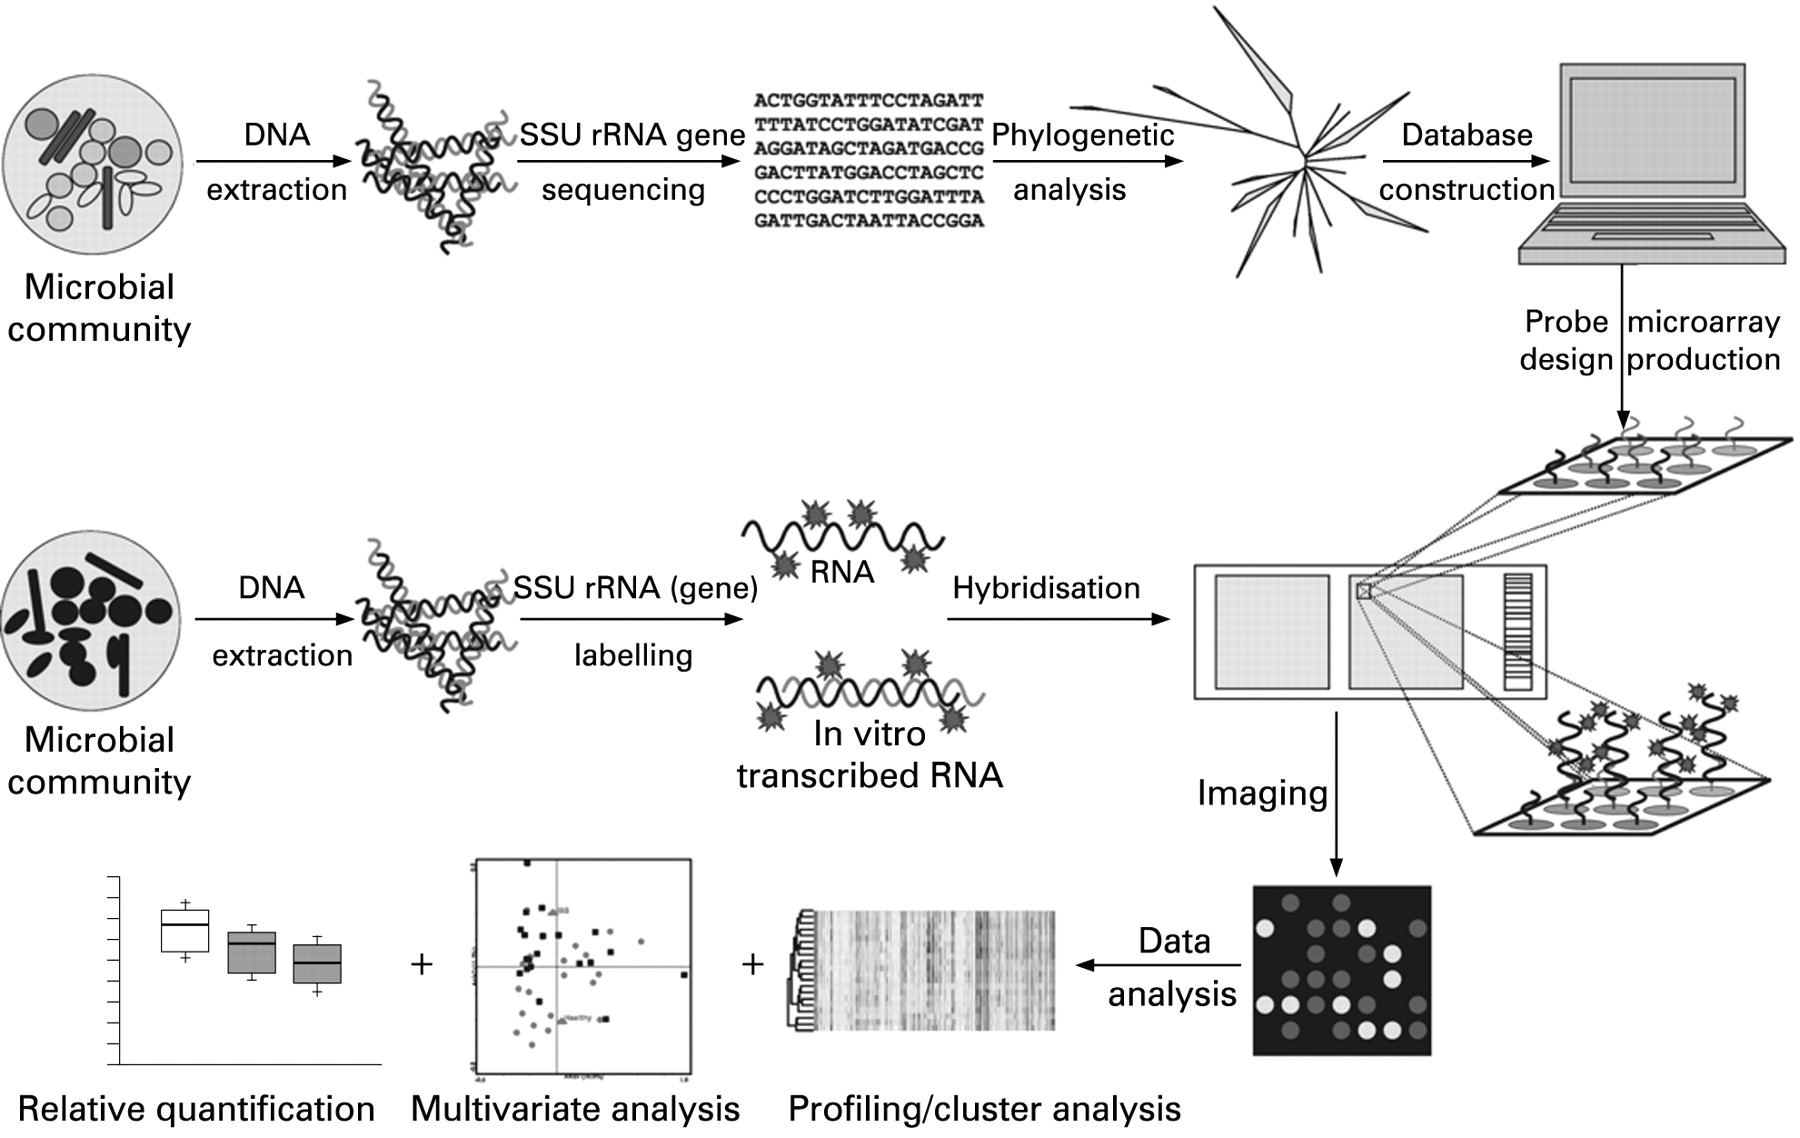 High Throughput Diversity And Functionality Analysis Of The Pump Action Shotgun Diagram Download Figure